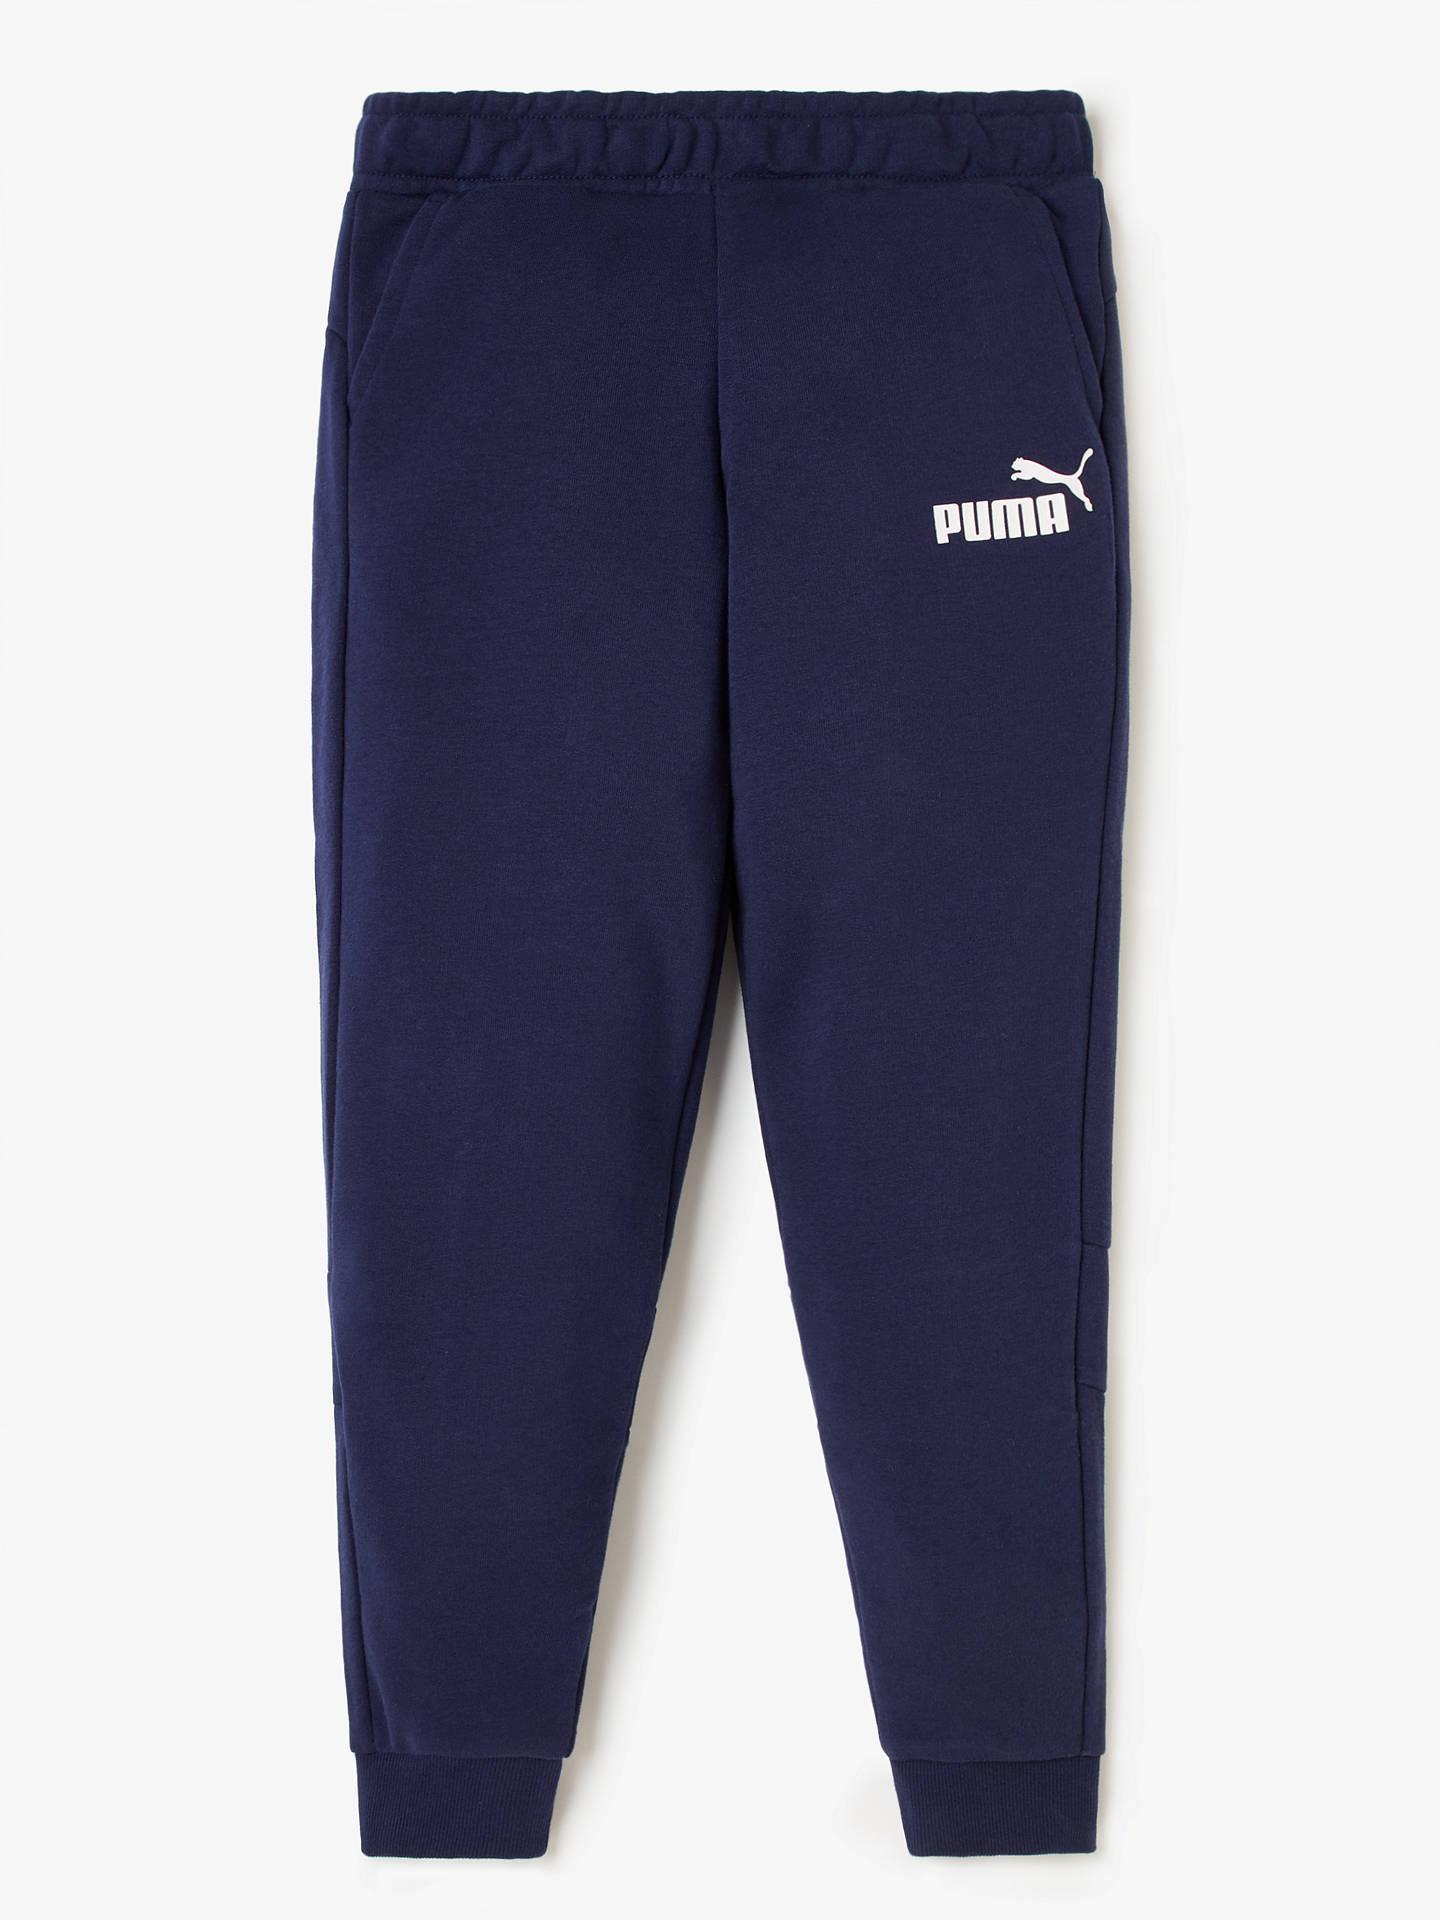 John Lewis Boys Navy Blue Performance PE Shorts Age 15-16 Brand New